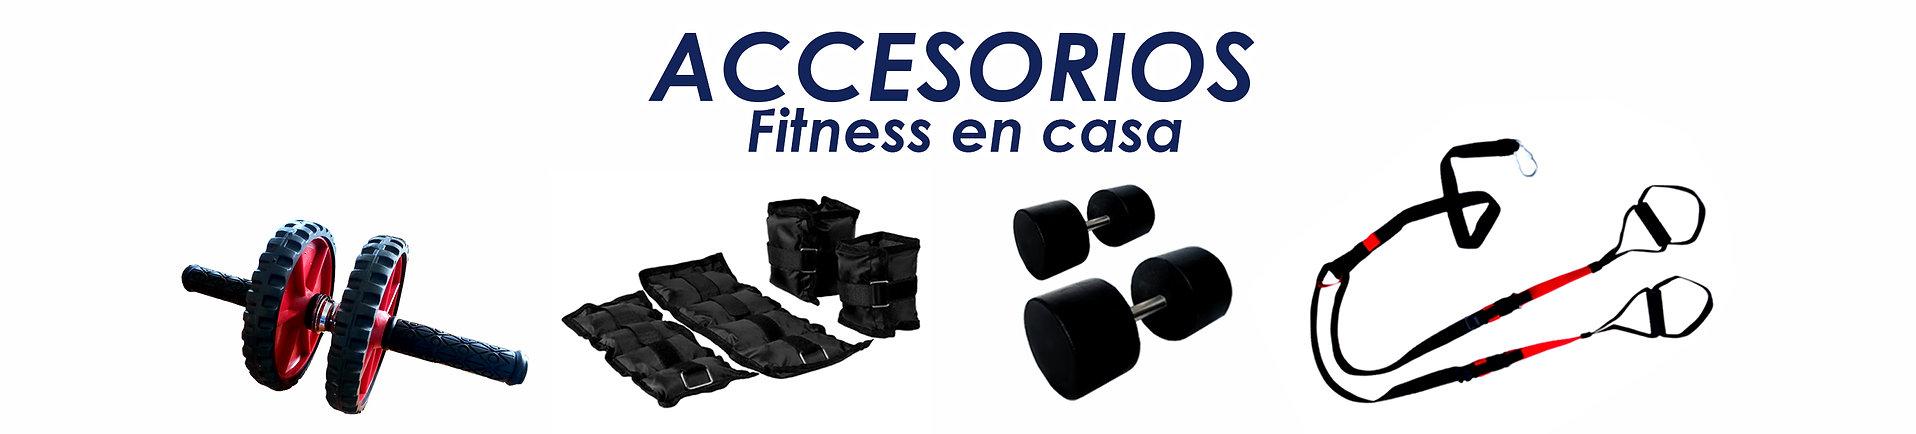 accesrosios fitness en casa.jpg